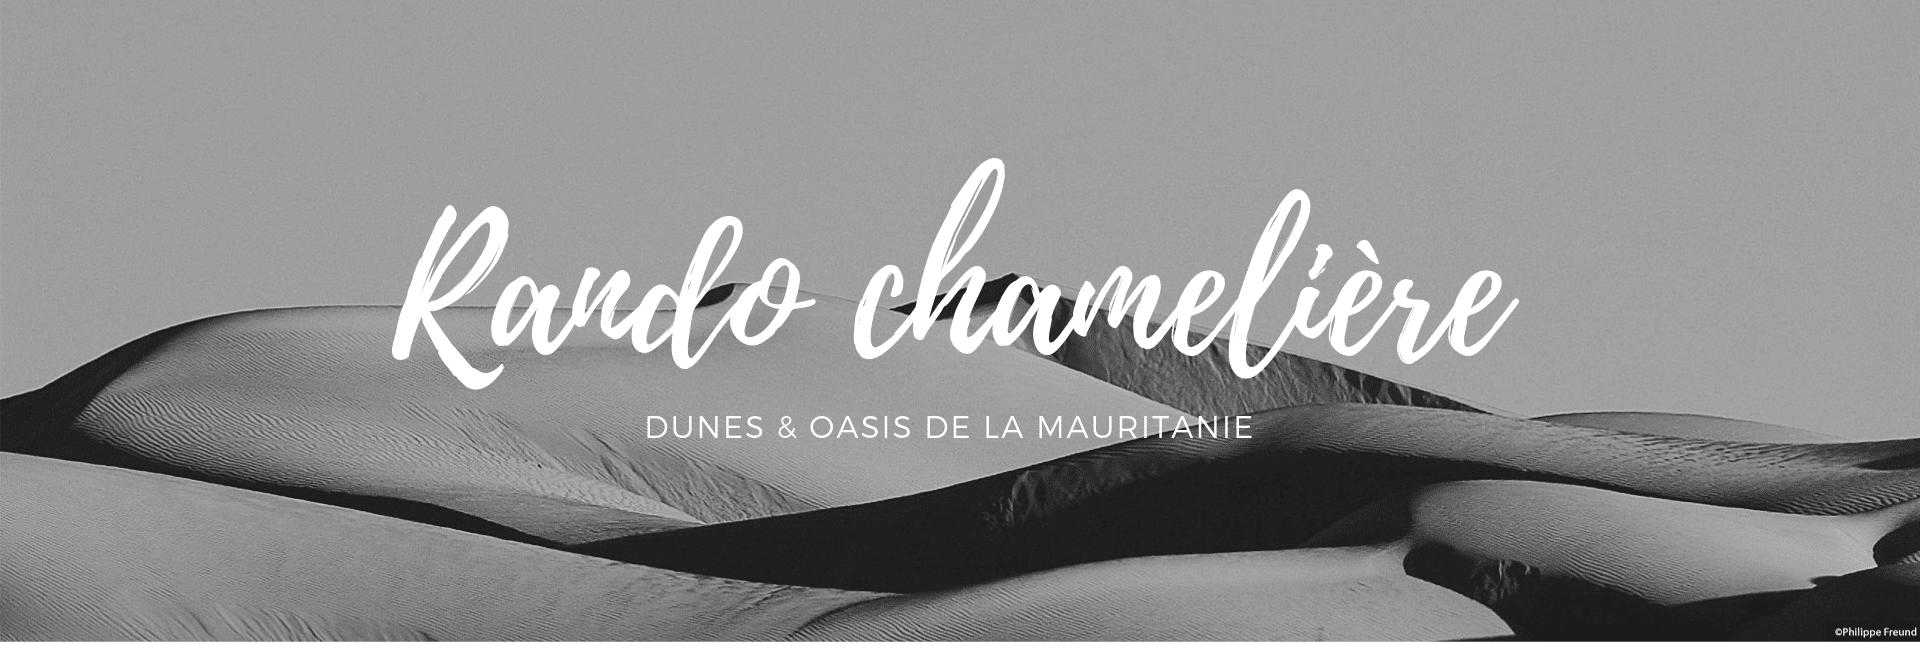 Rando chamelière en mauritanie